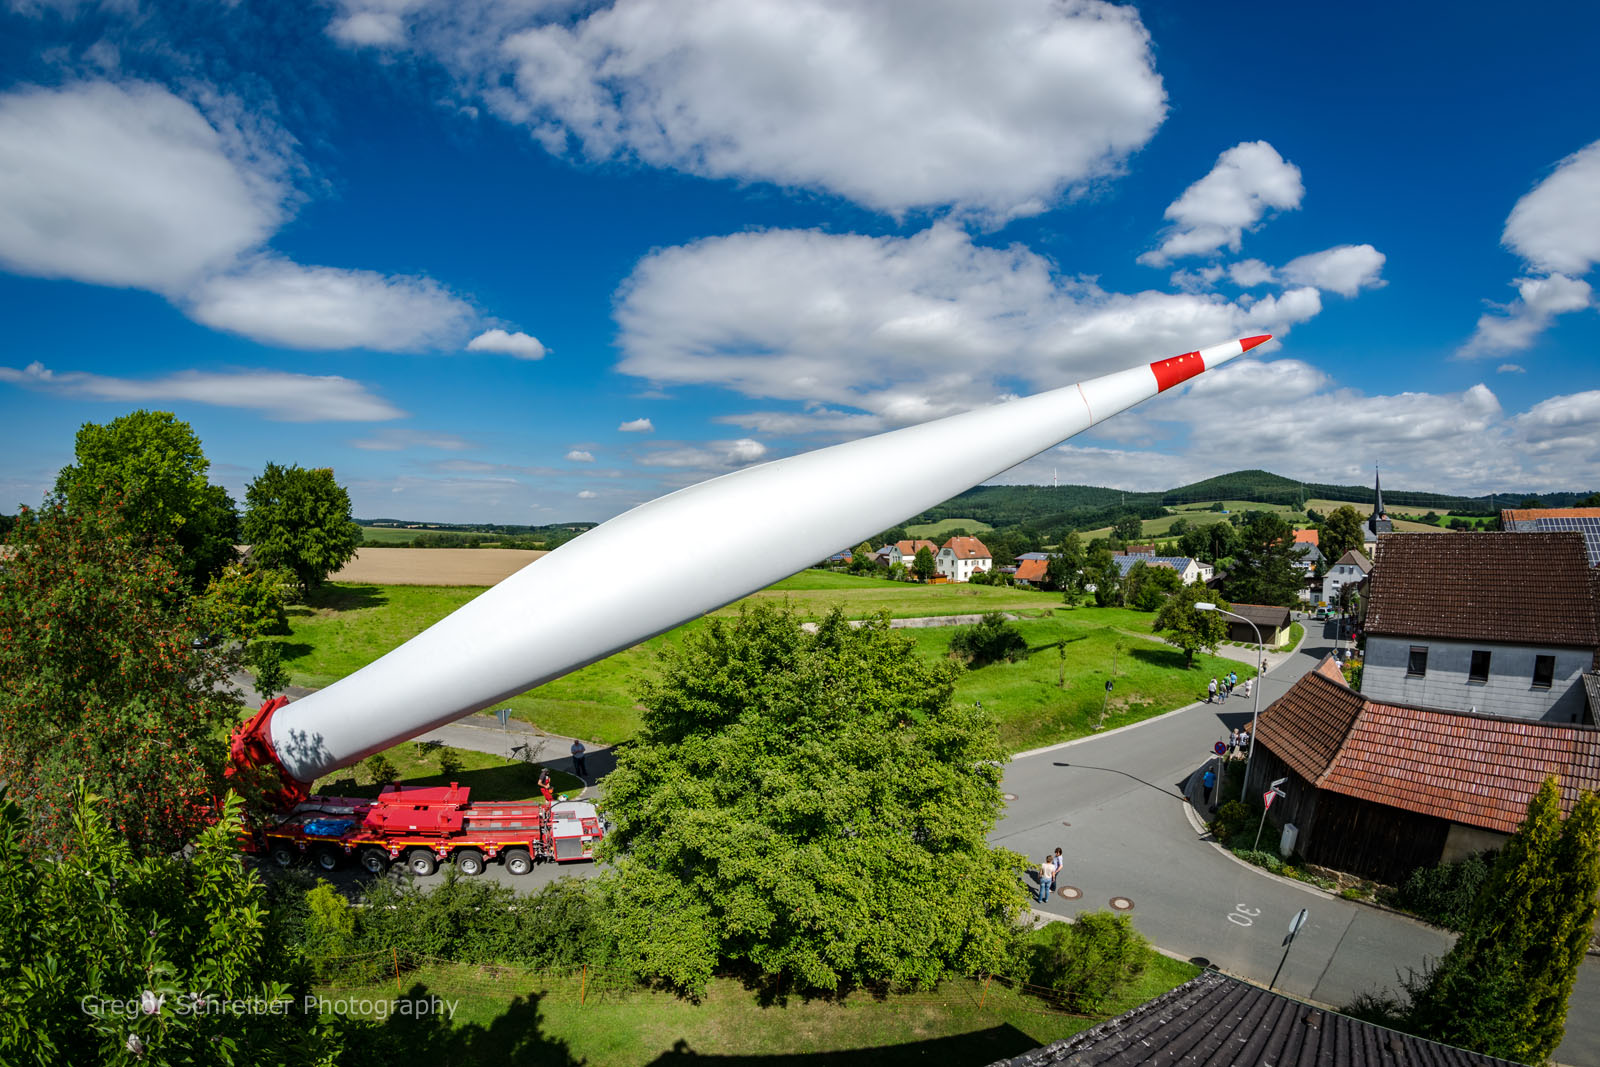 Flügeltransport Gärtenroth - Windpark Hain